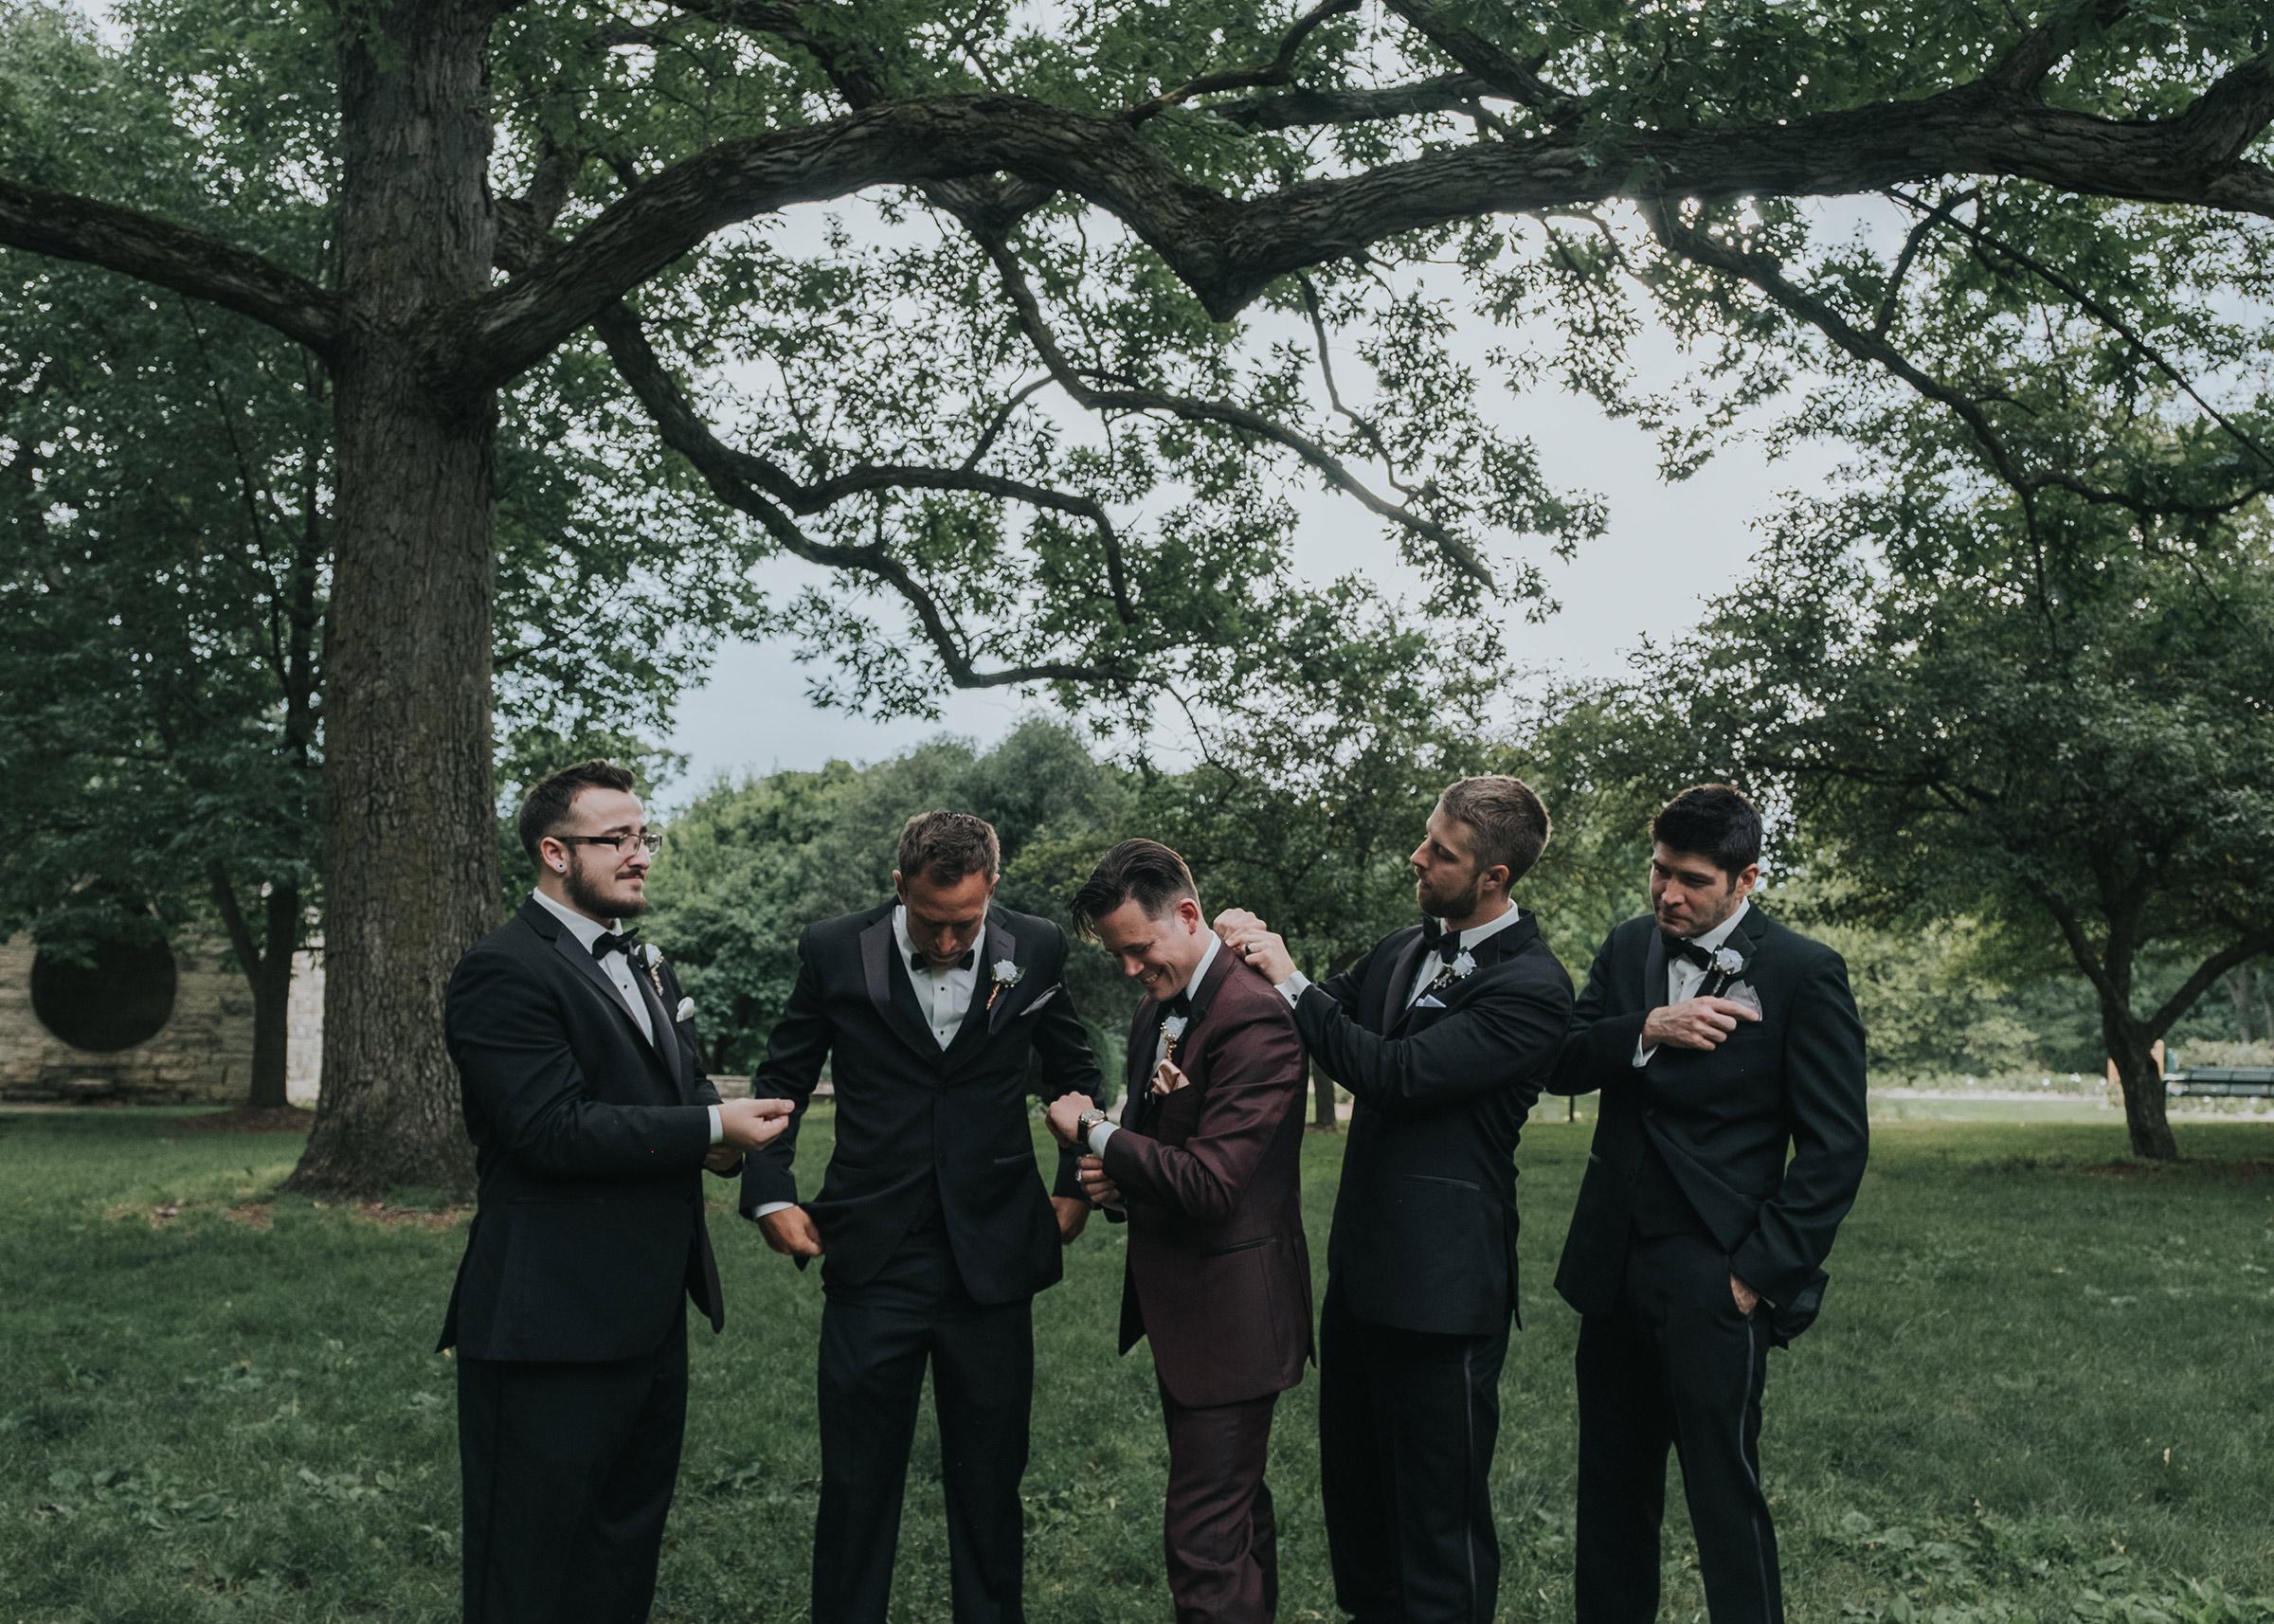 groomsmen-helping-groom-fix-clothing-desmoines-iowa-art-center-raelyn-ramey-photography.jpg